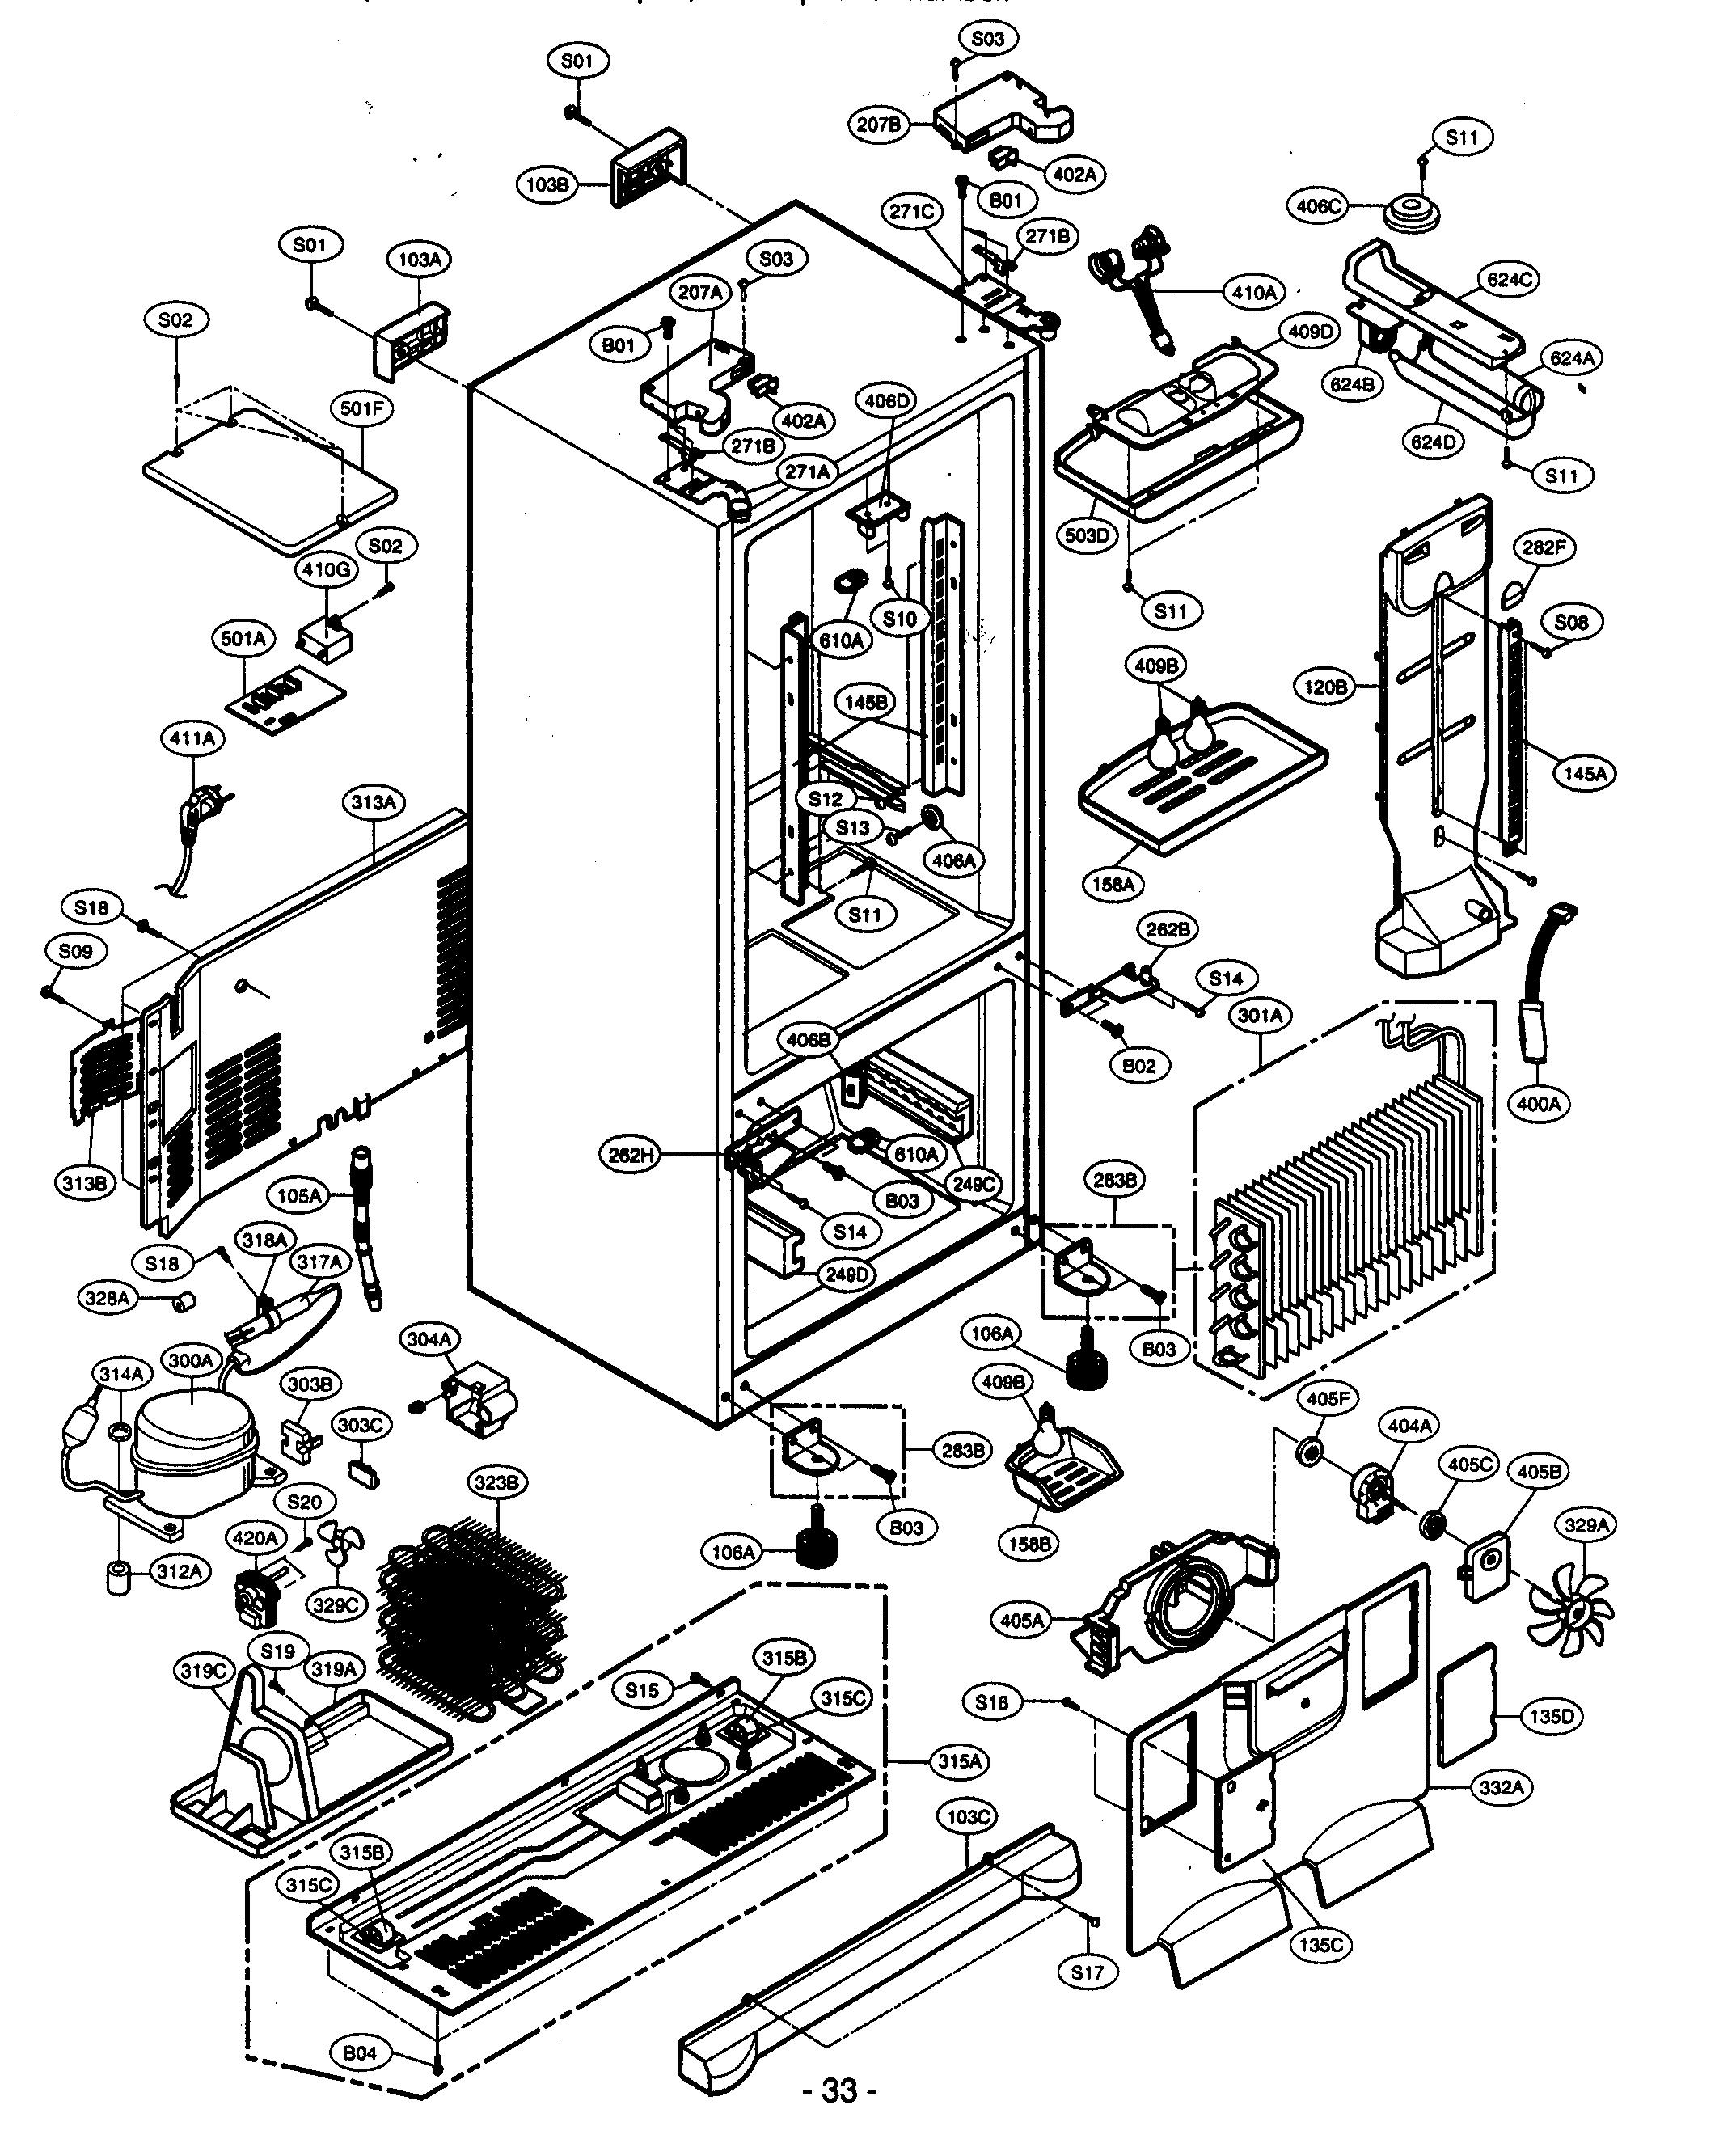 Kenmore Freezer Parts Diagram Modern Design Of Wiring Upright Sears Refrigerator Model 106 Microwave